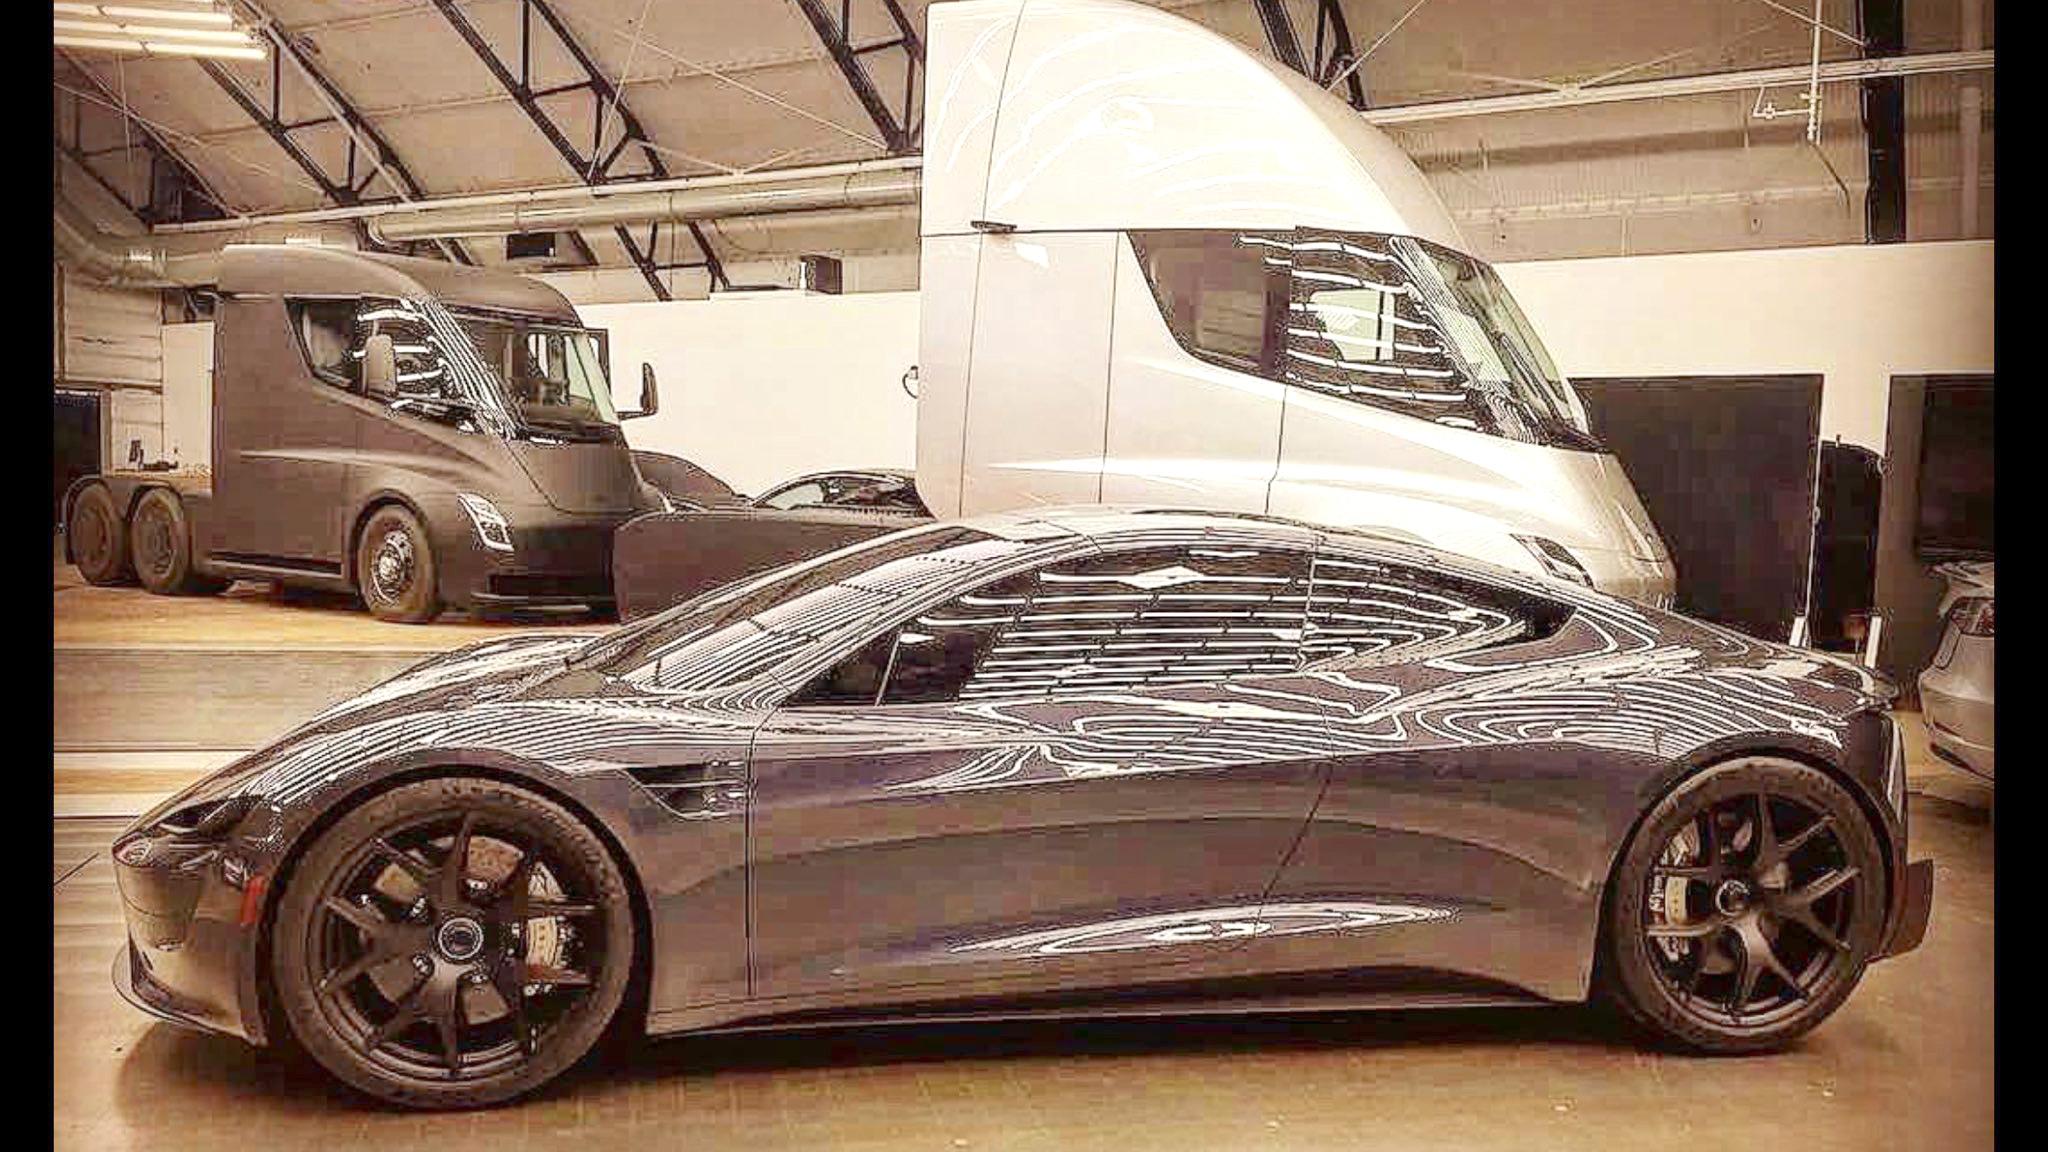 2019 Tesla Roadster leaked photo along with Tesla Semi trucks